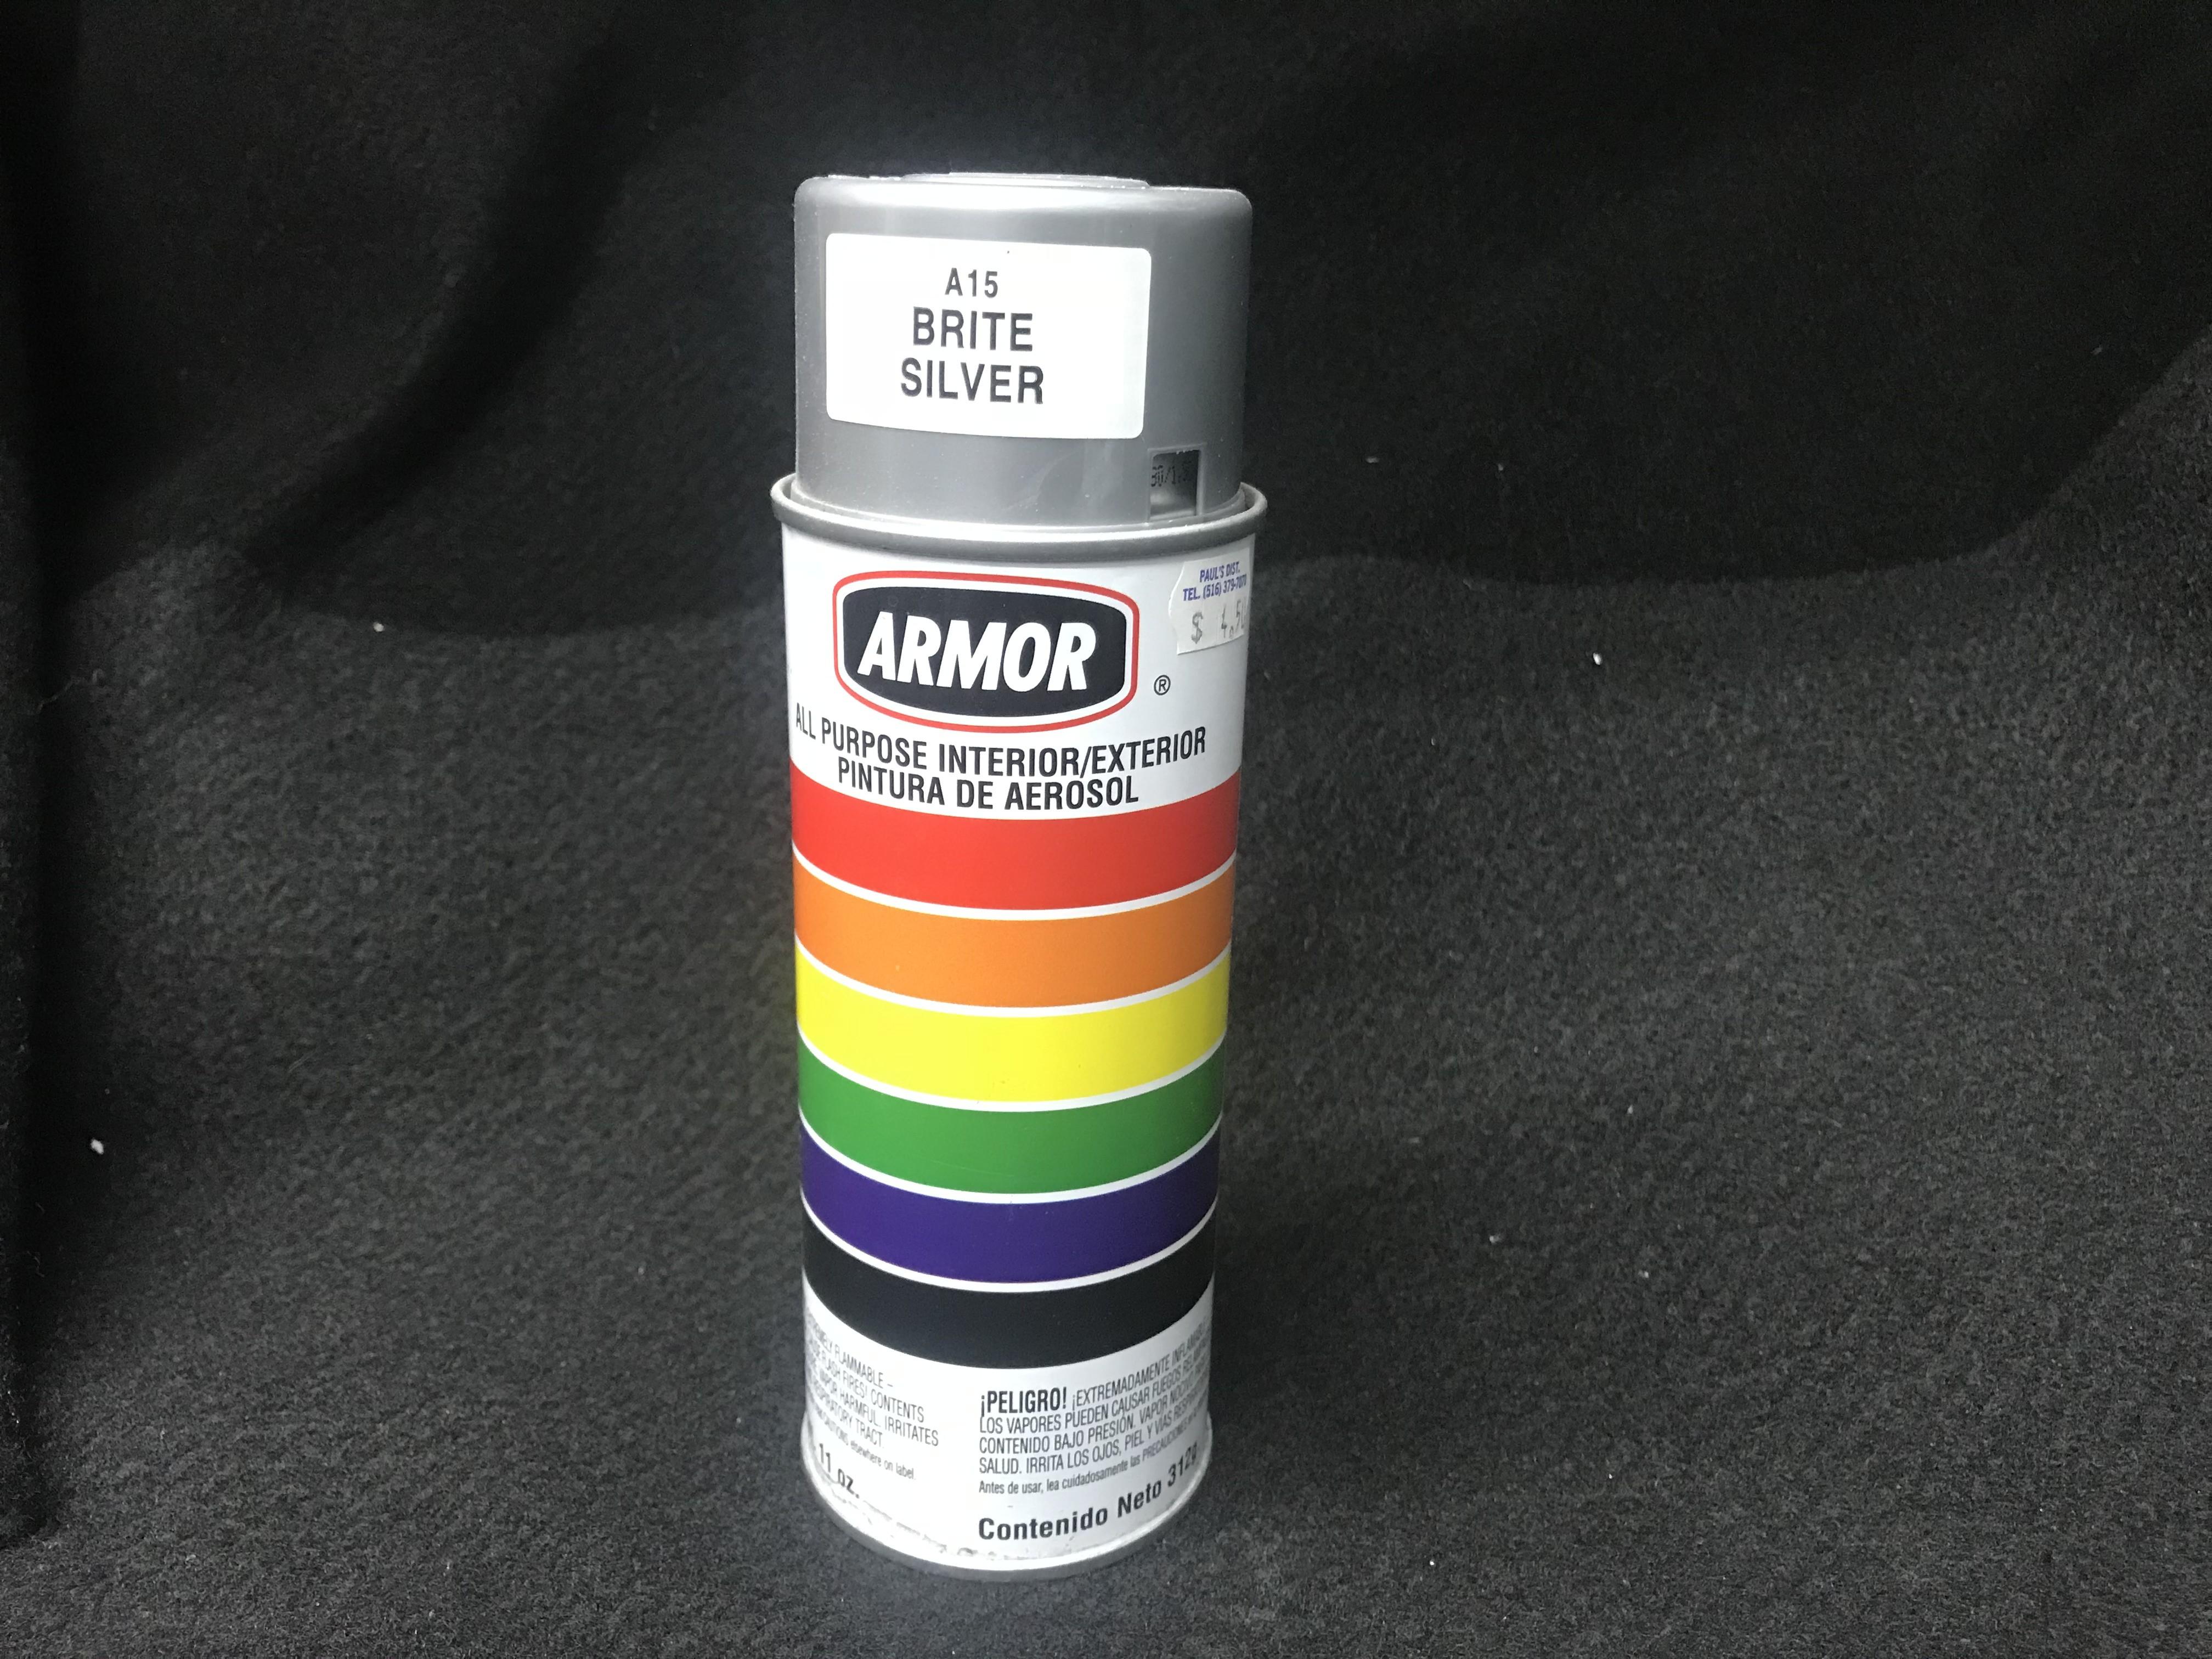 Armor Brite Silver Spray Paint